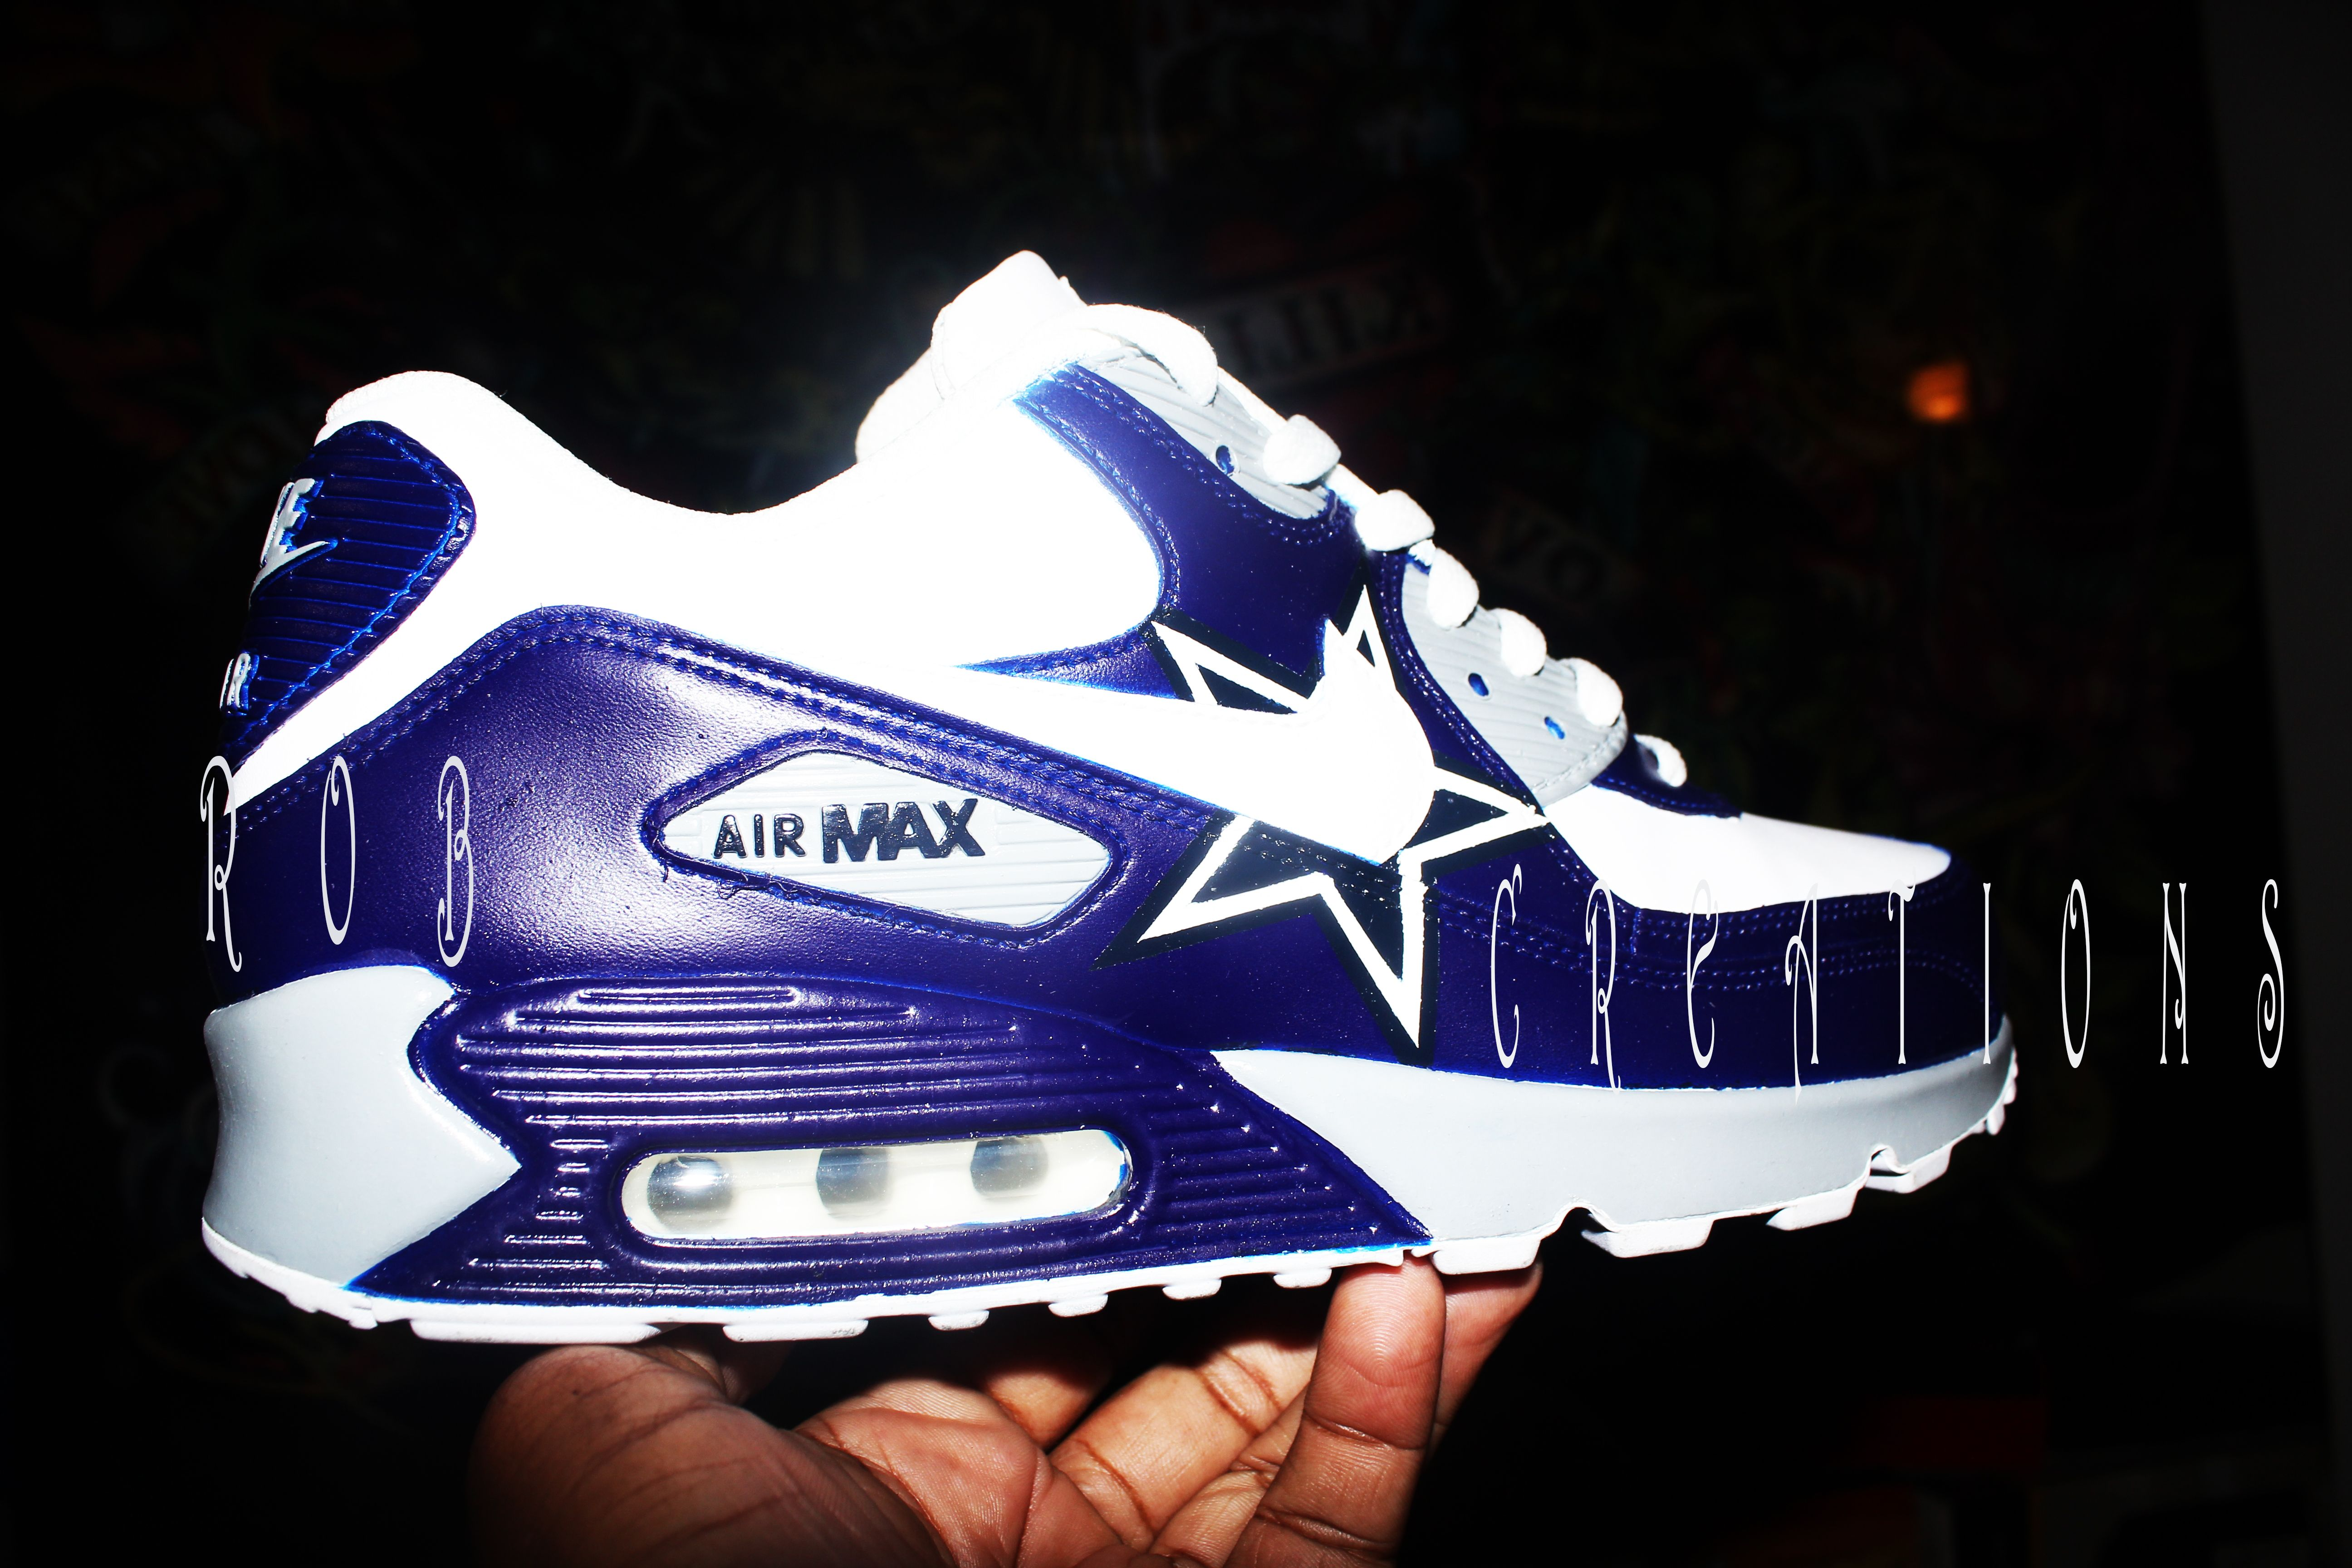 dallas cowboys nike air max shoes